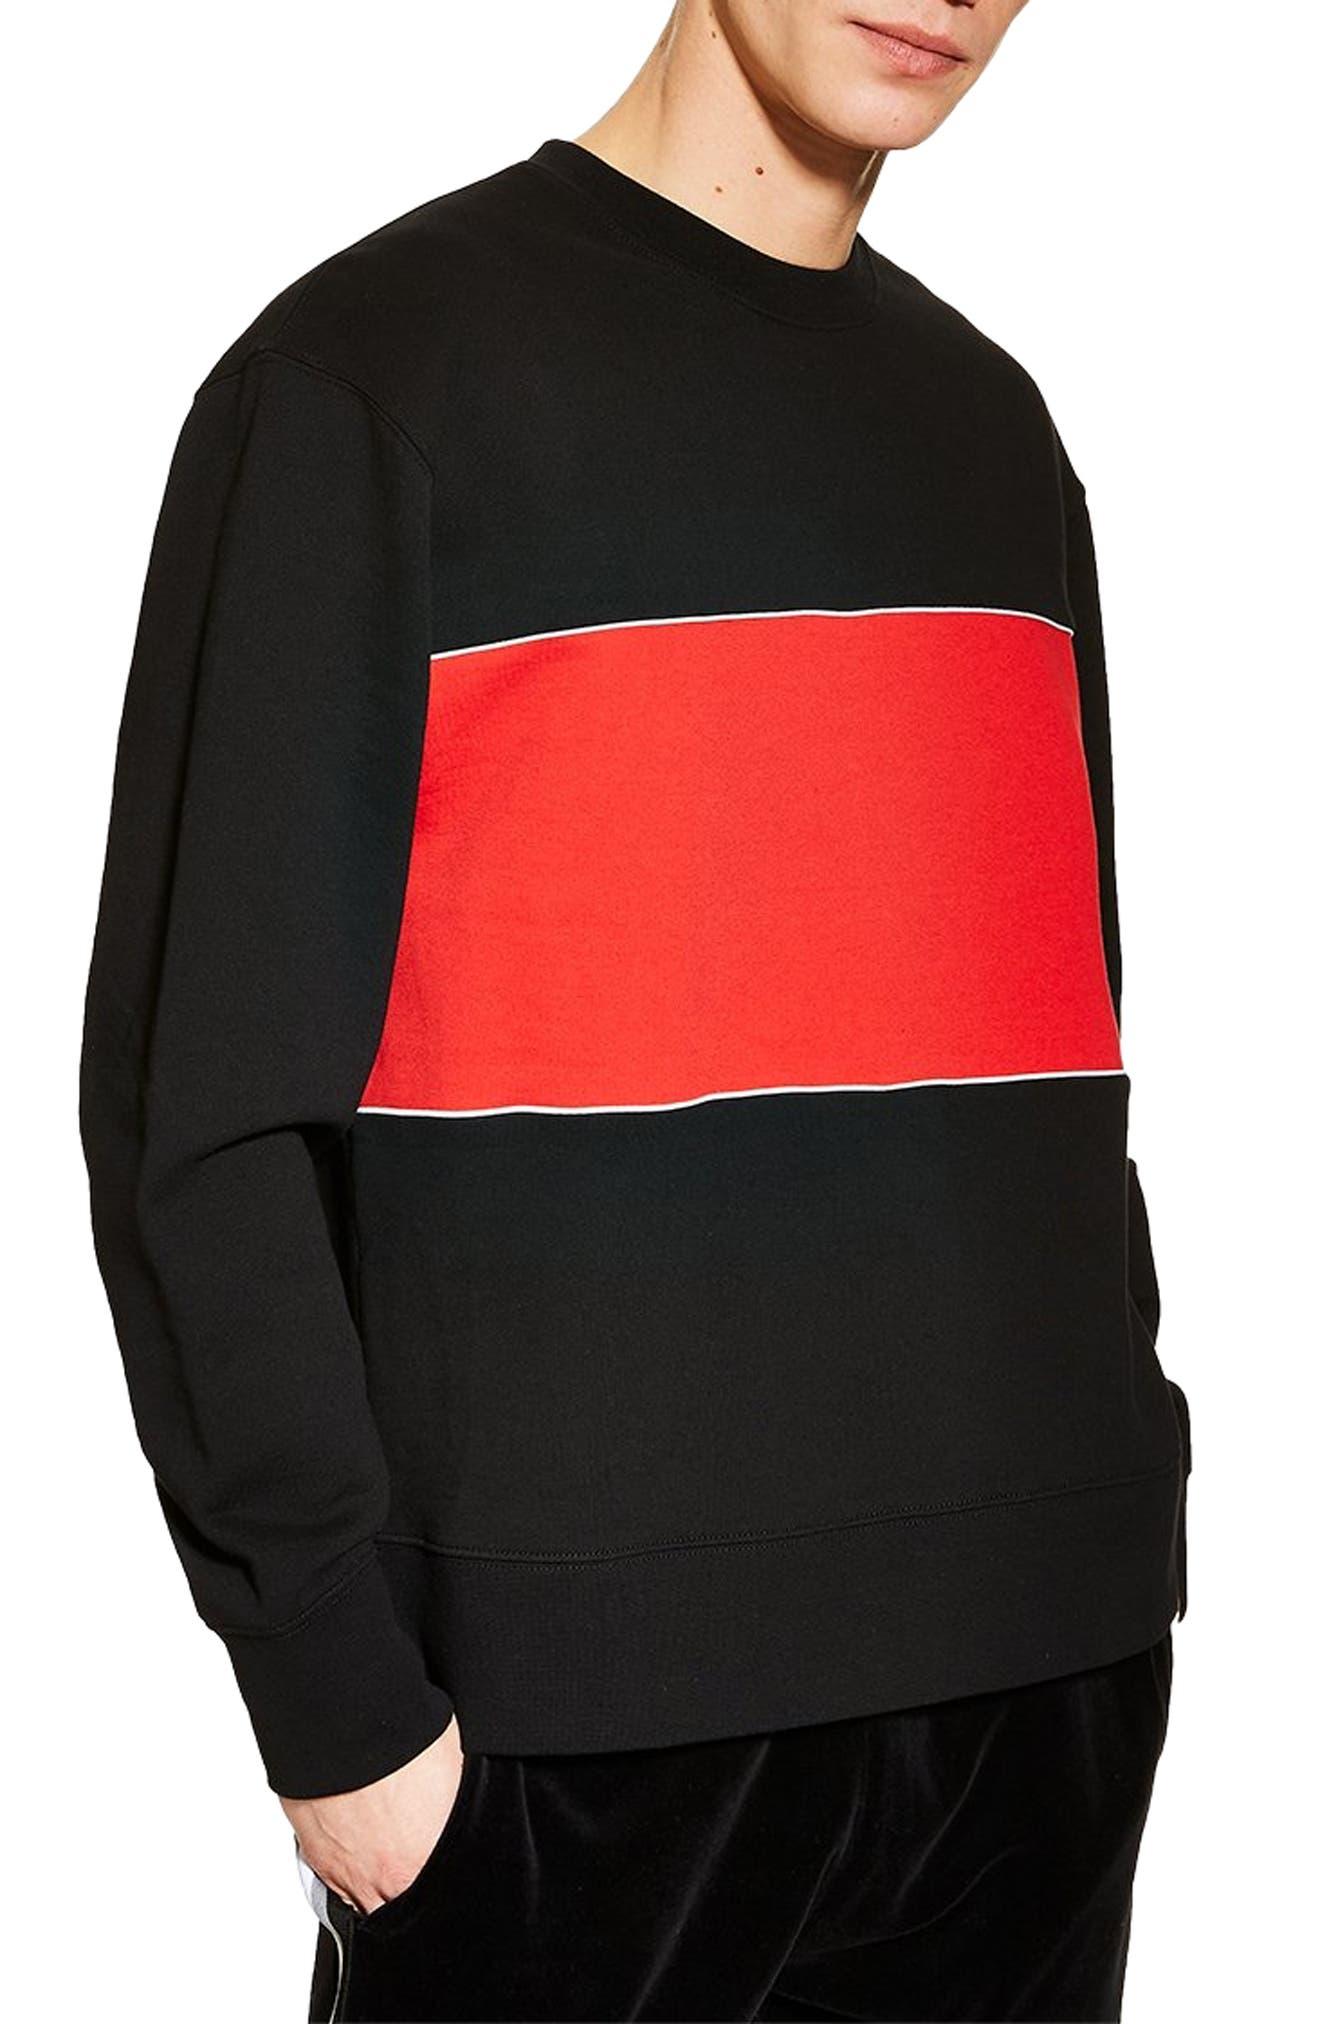 TOPMAN Colorblock Longline Crewneck Sweatshirt, Main, color, BLACK